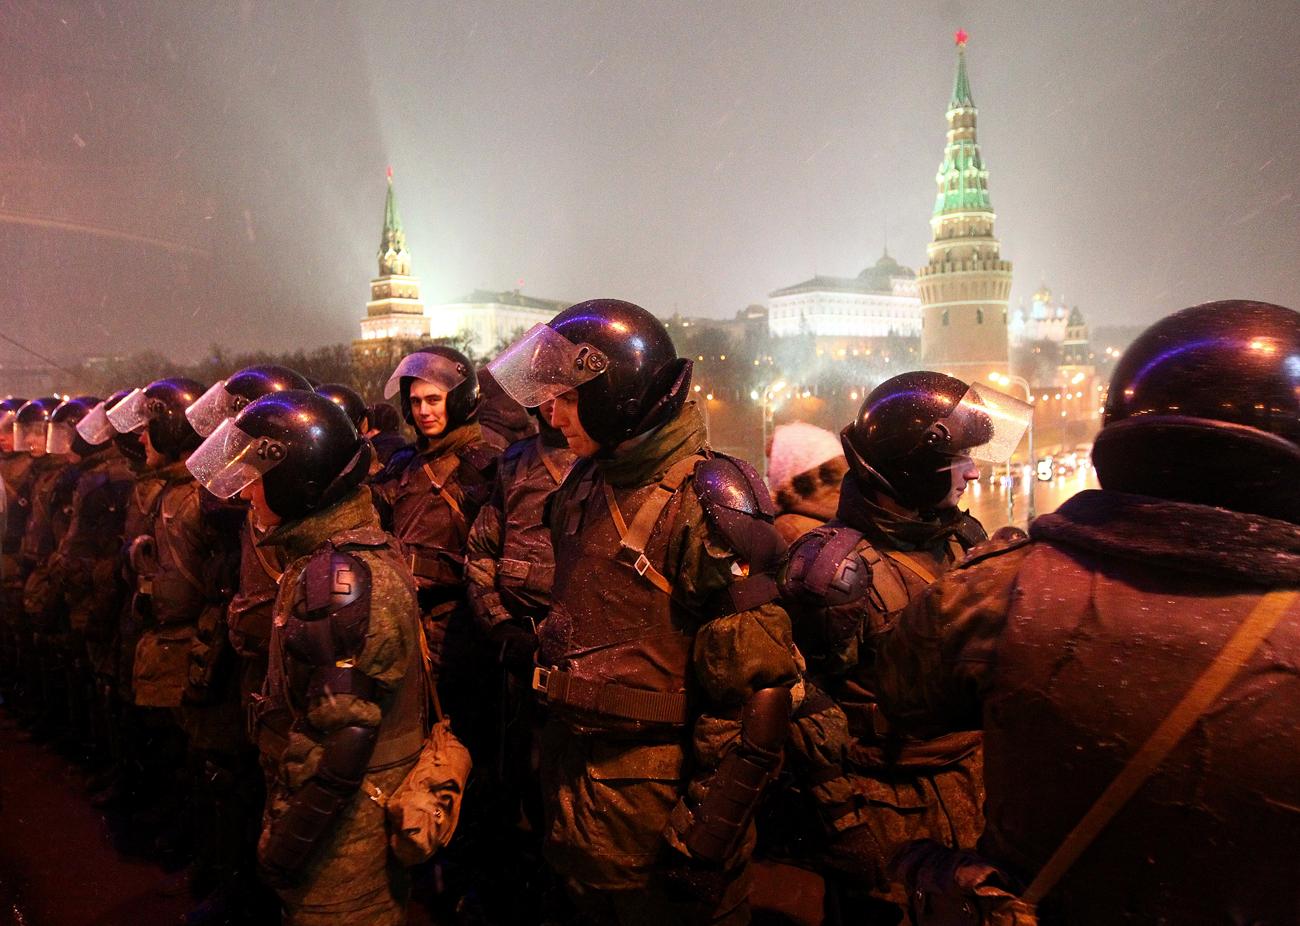 Crédit : Andrey Stenin / RIA Novosti